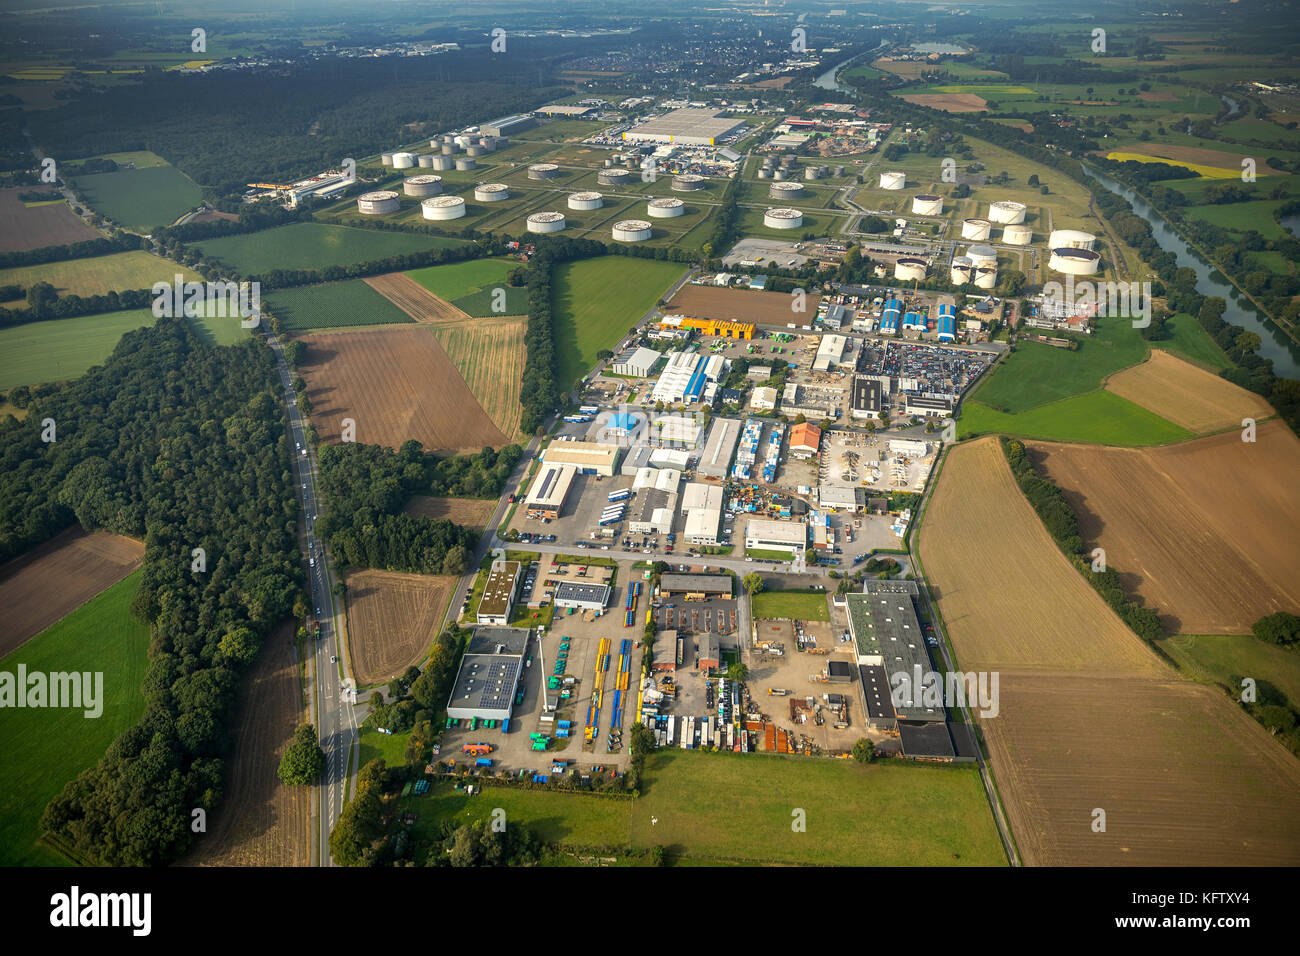 Hünxe, LGI Logistics Group International GmbH, SF Soepenberg GmbH, recyclers Franz-Josef Kipp, Hünxe, - Stock Image